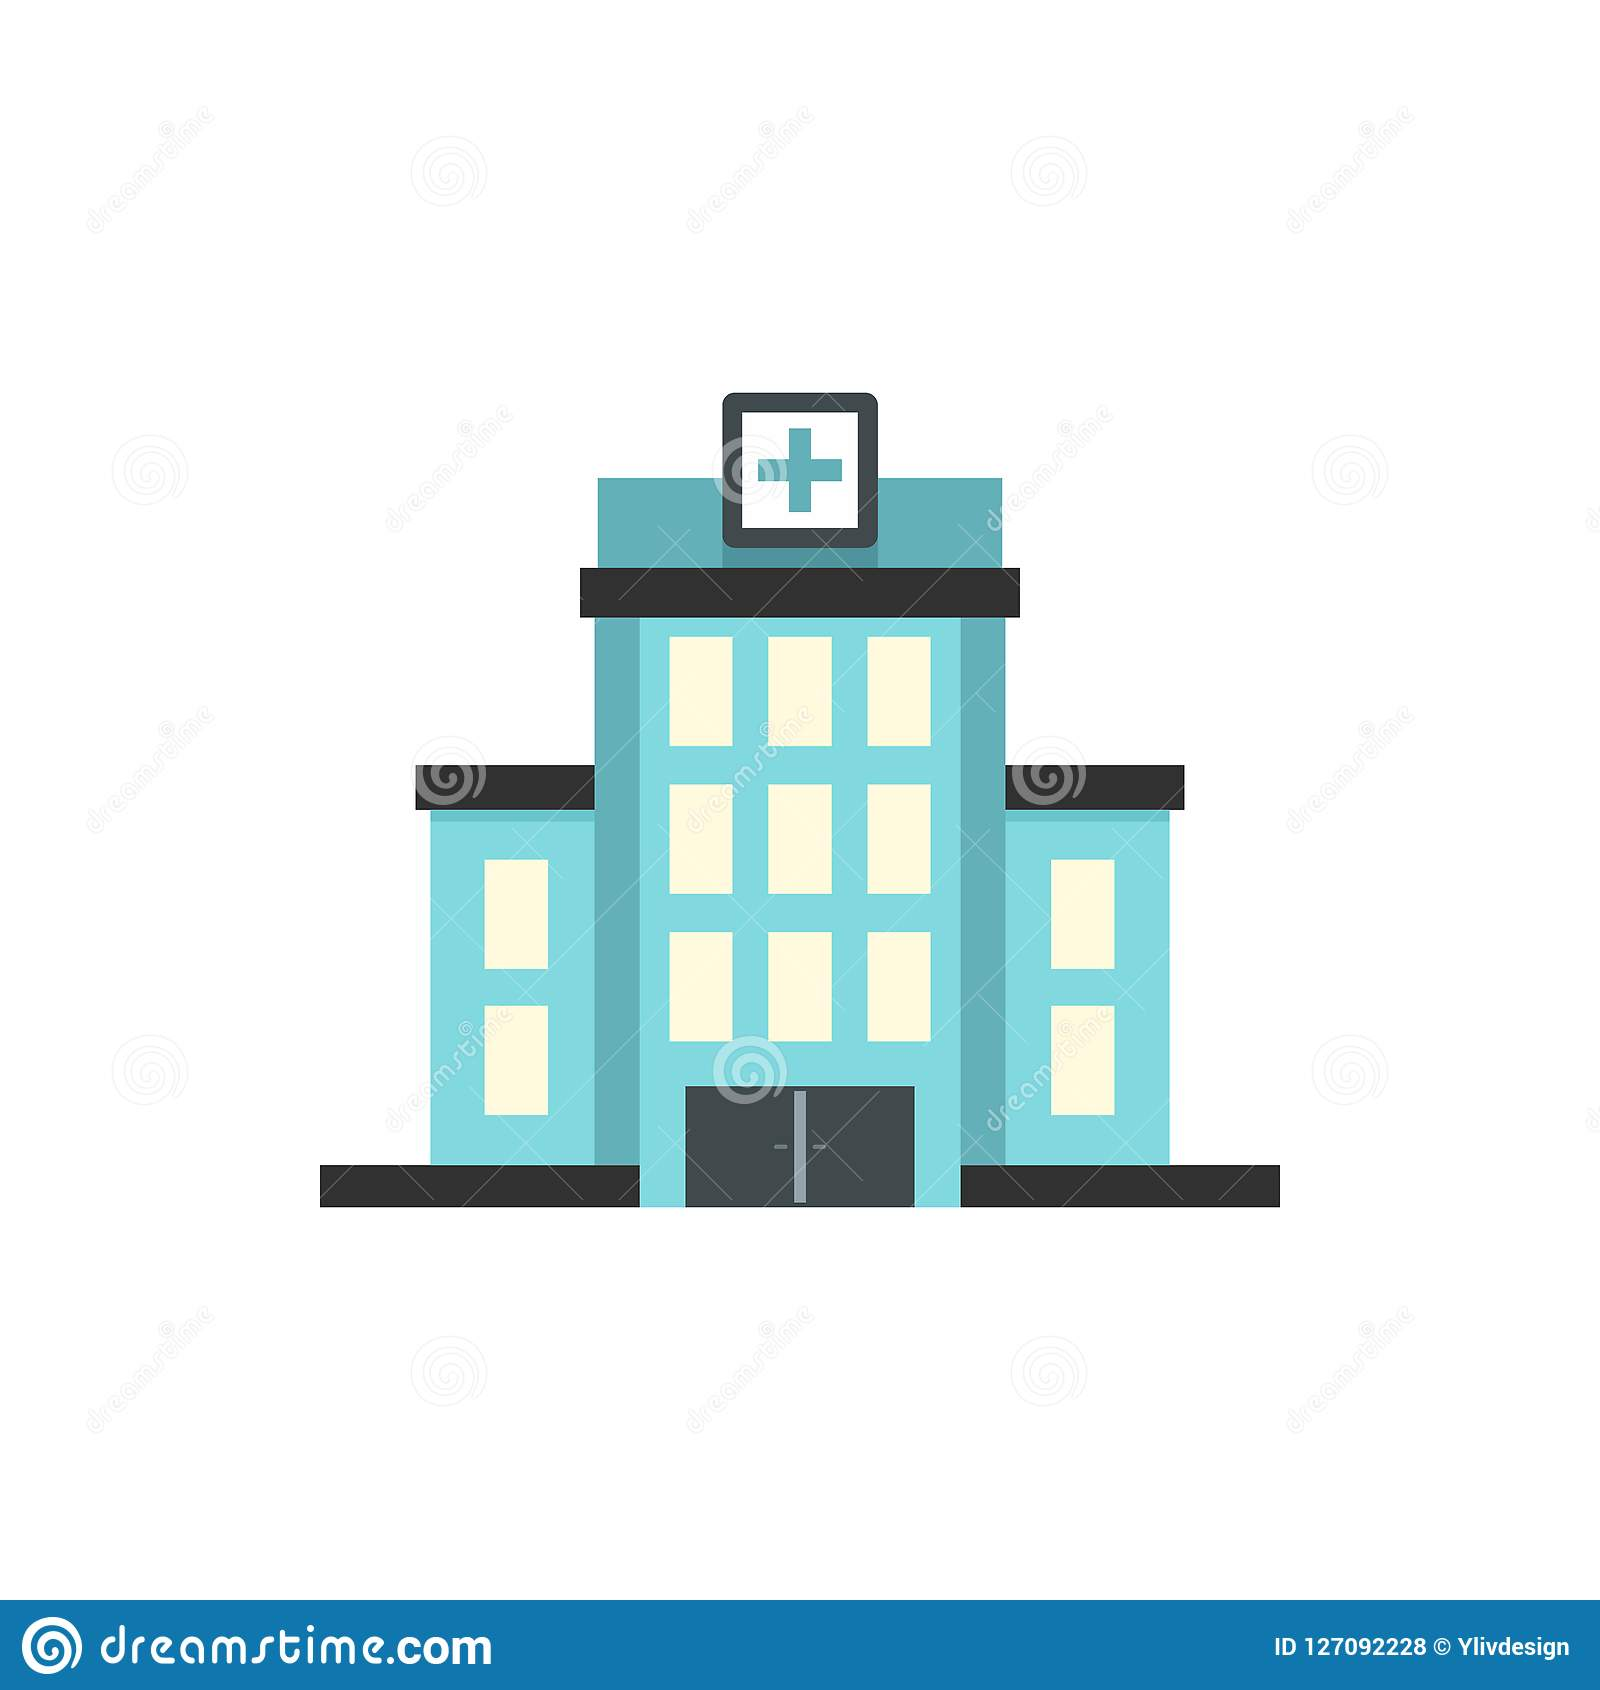 Hospital building icon, flat style